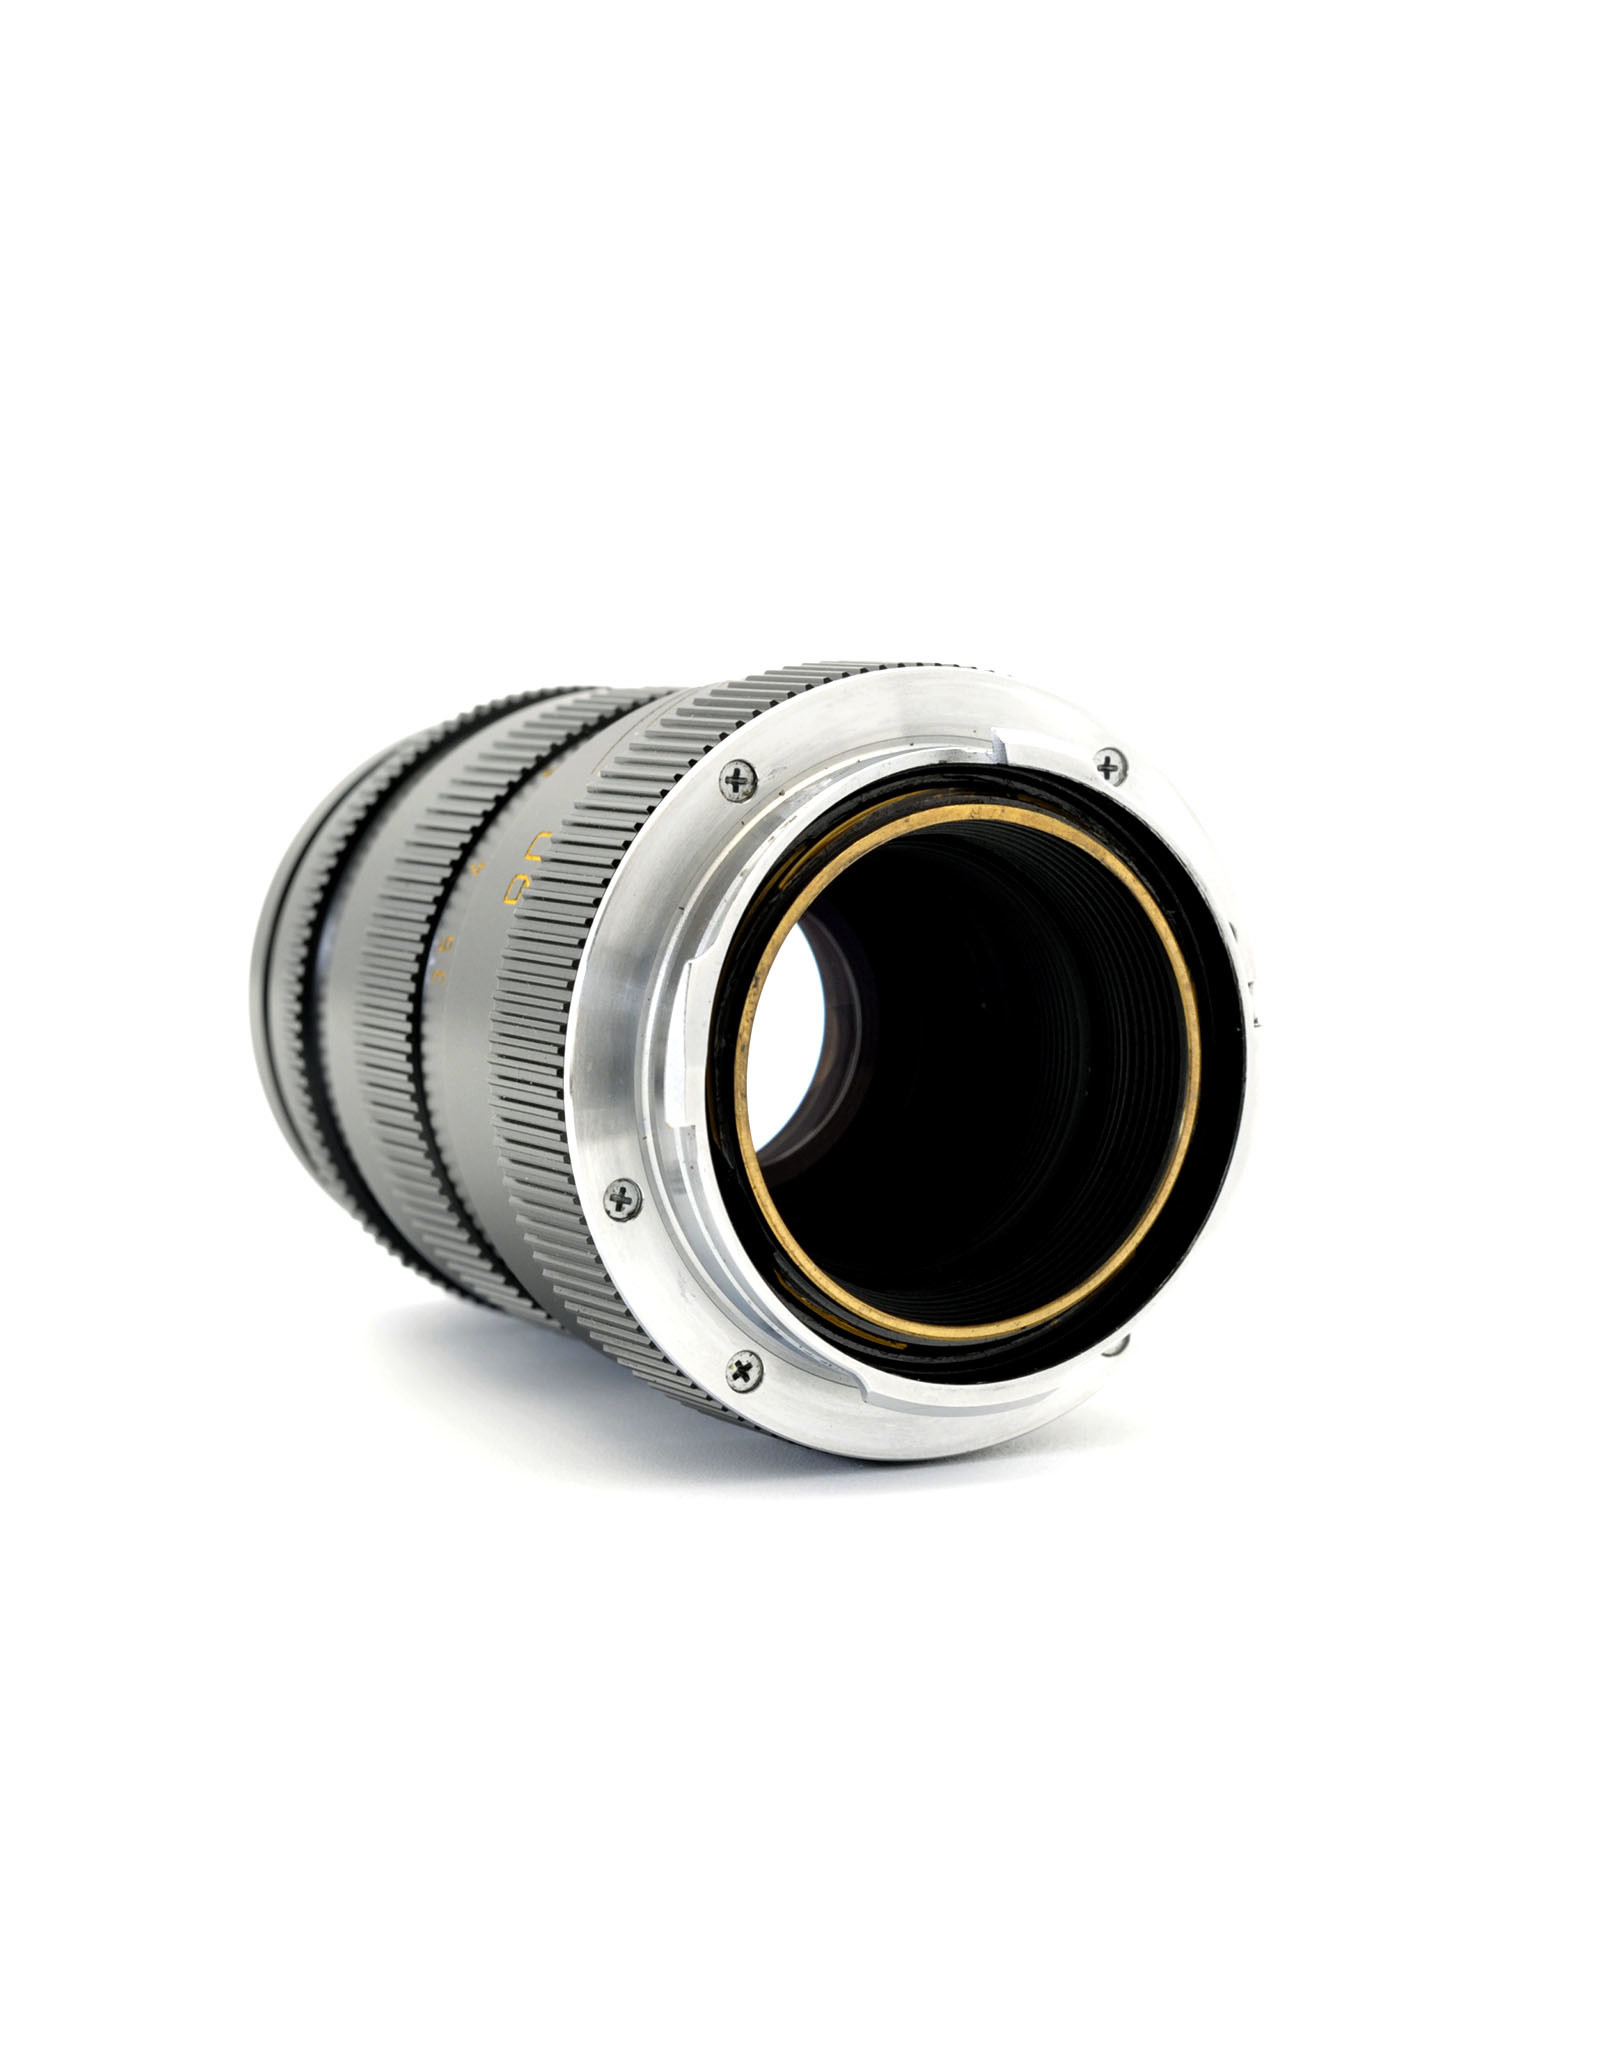 Leica Leica 90mm f2.8 Tele-Elmarit-M (1913-1983) 70 years Anniversary Edition   AP1091503